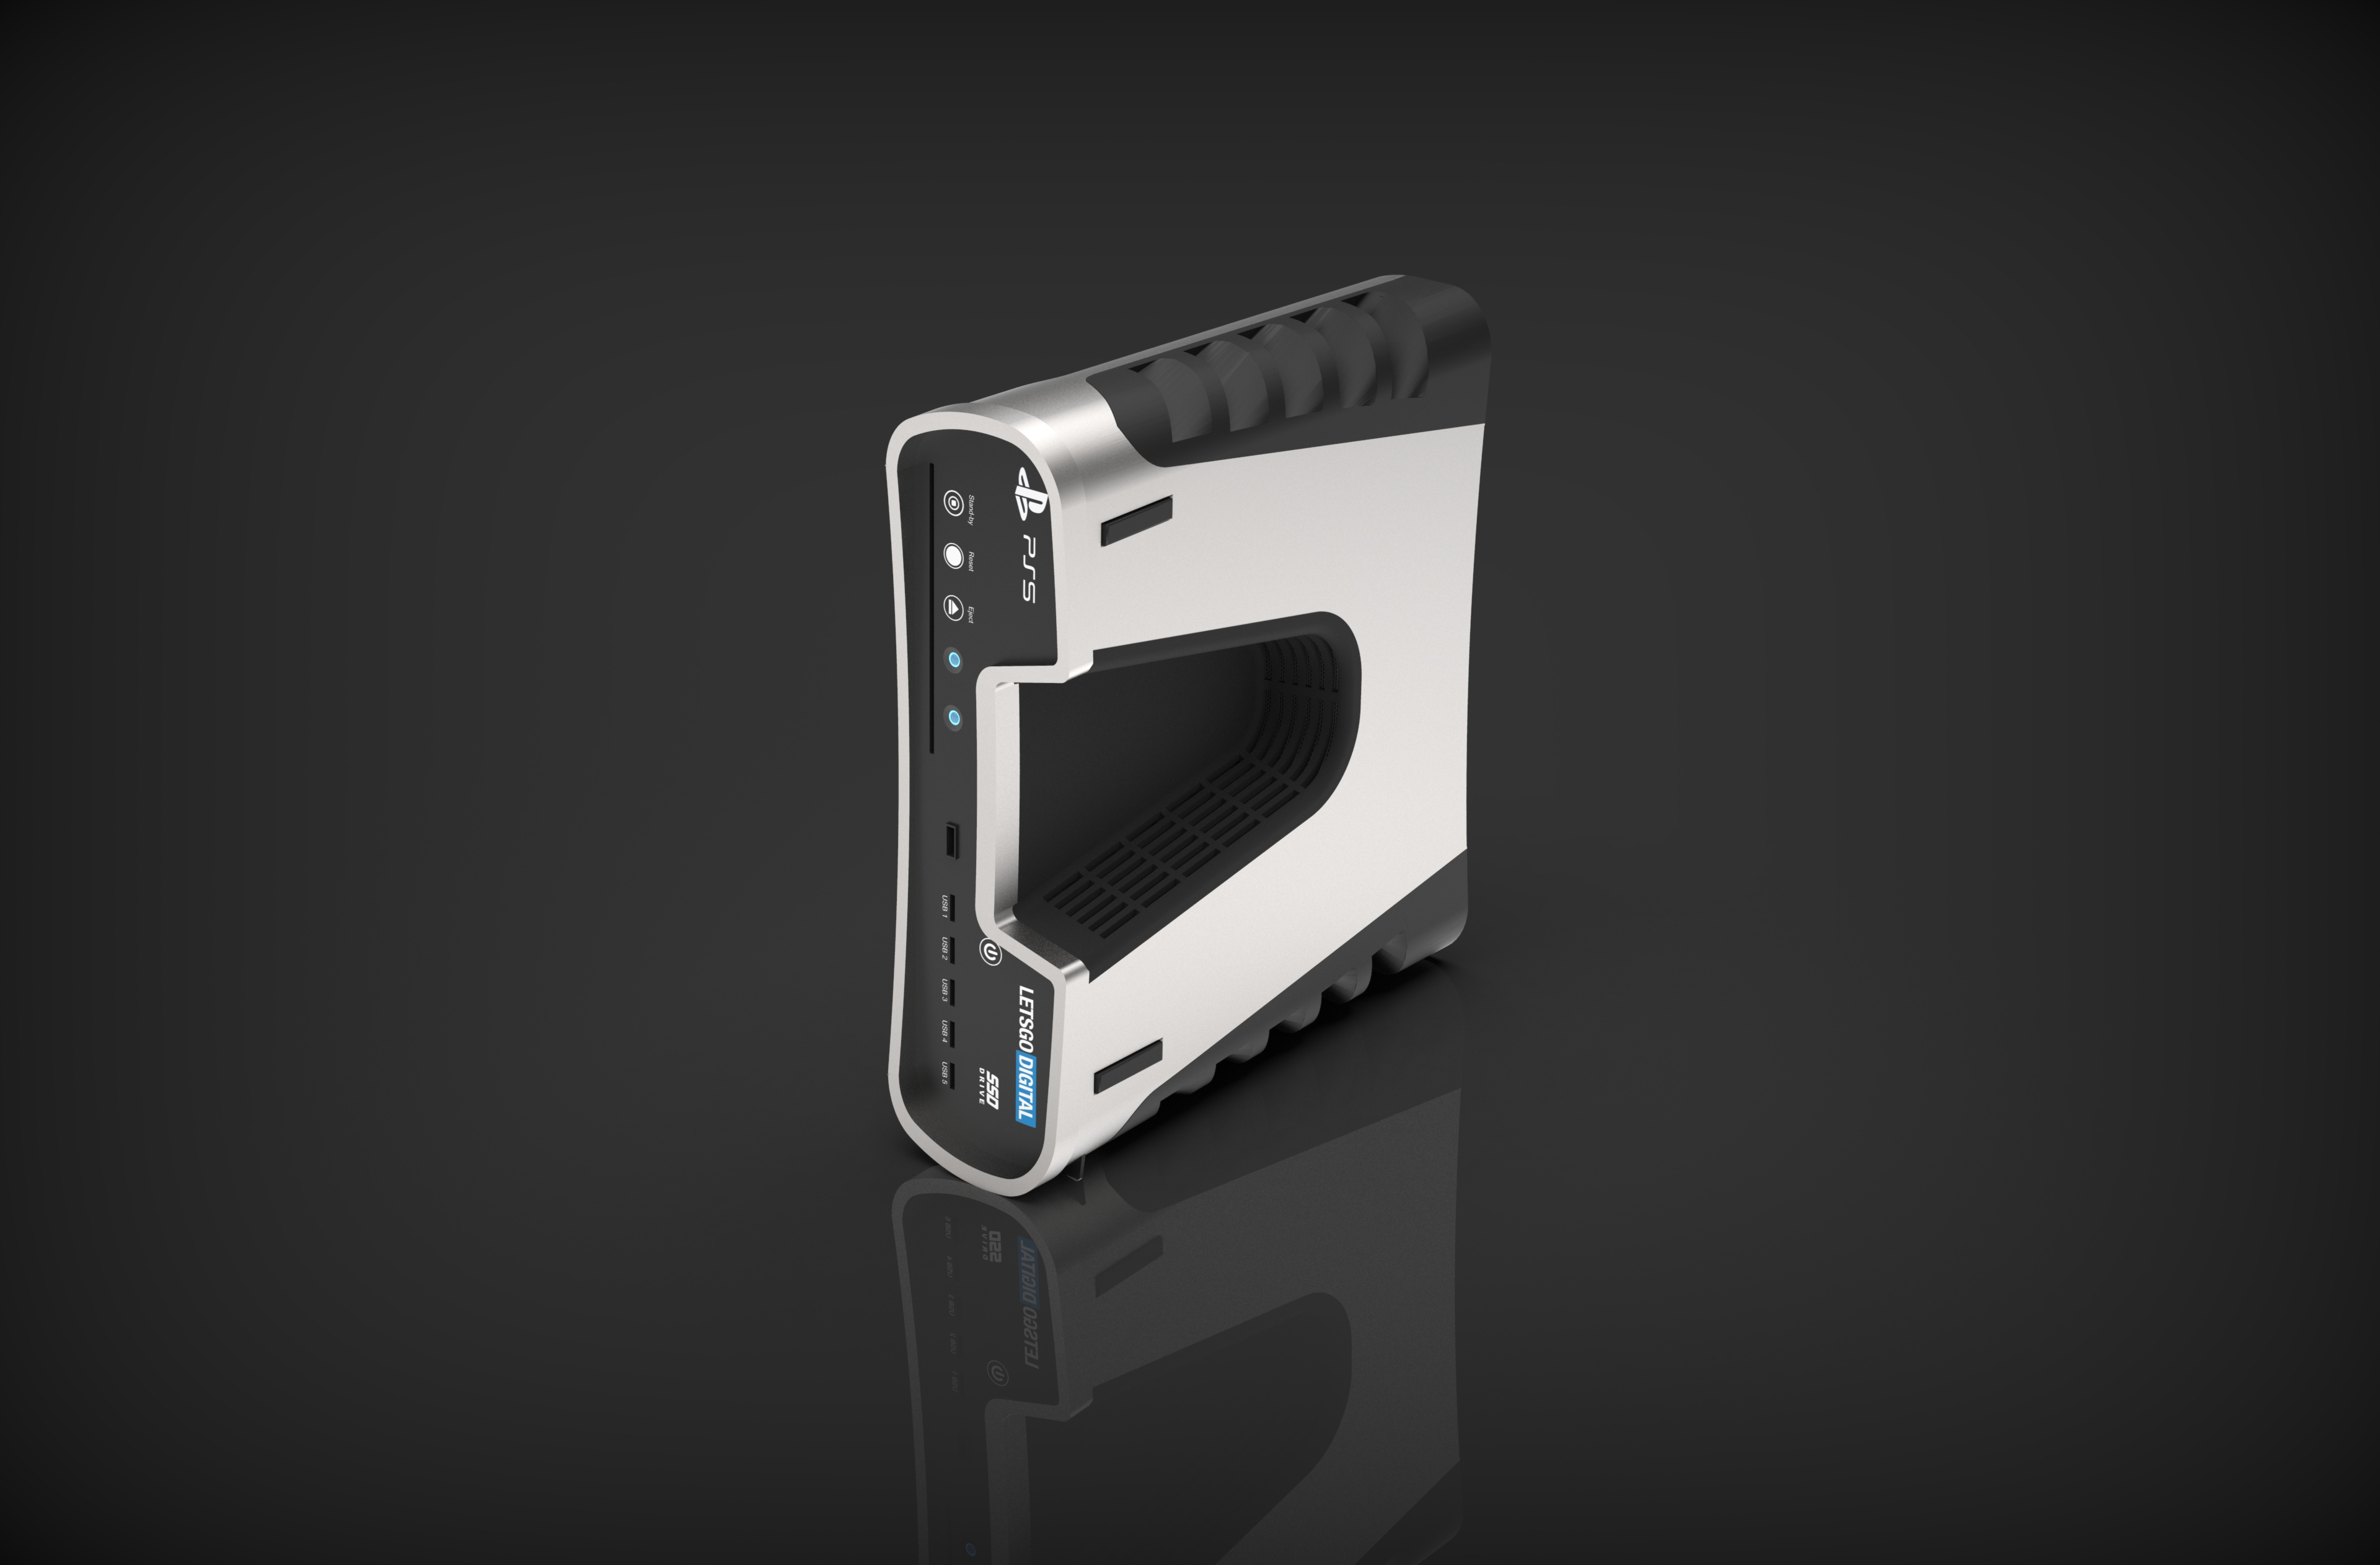 playstation-5-prototype.jpg